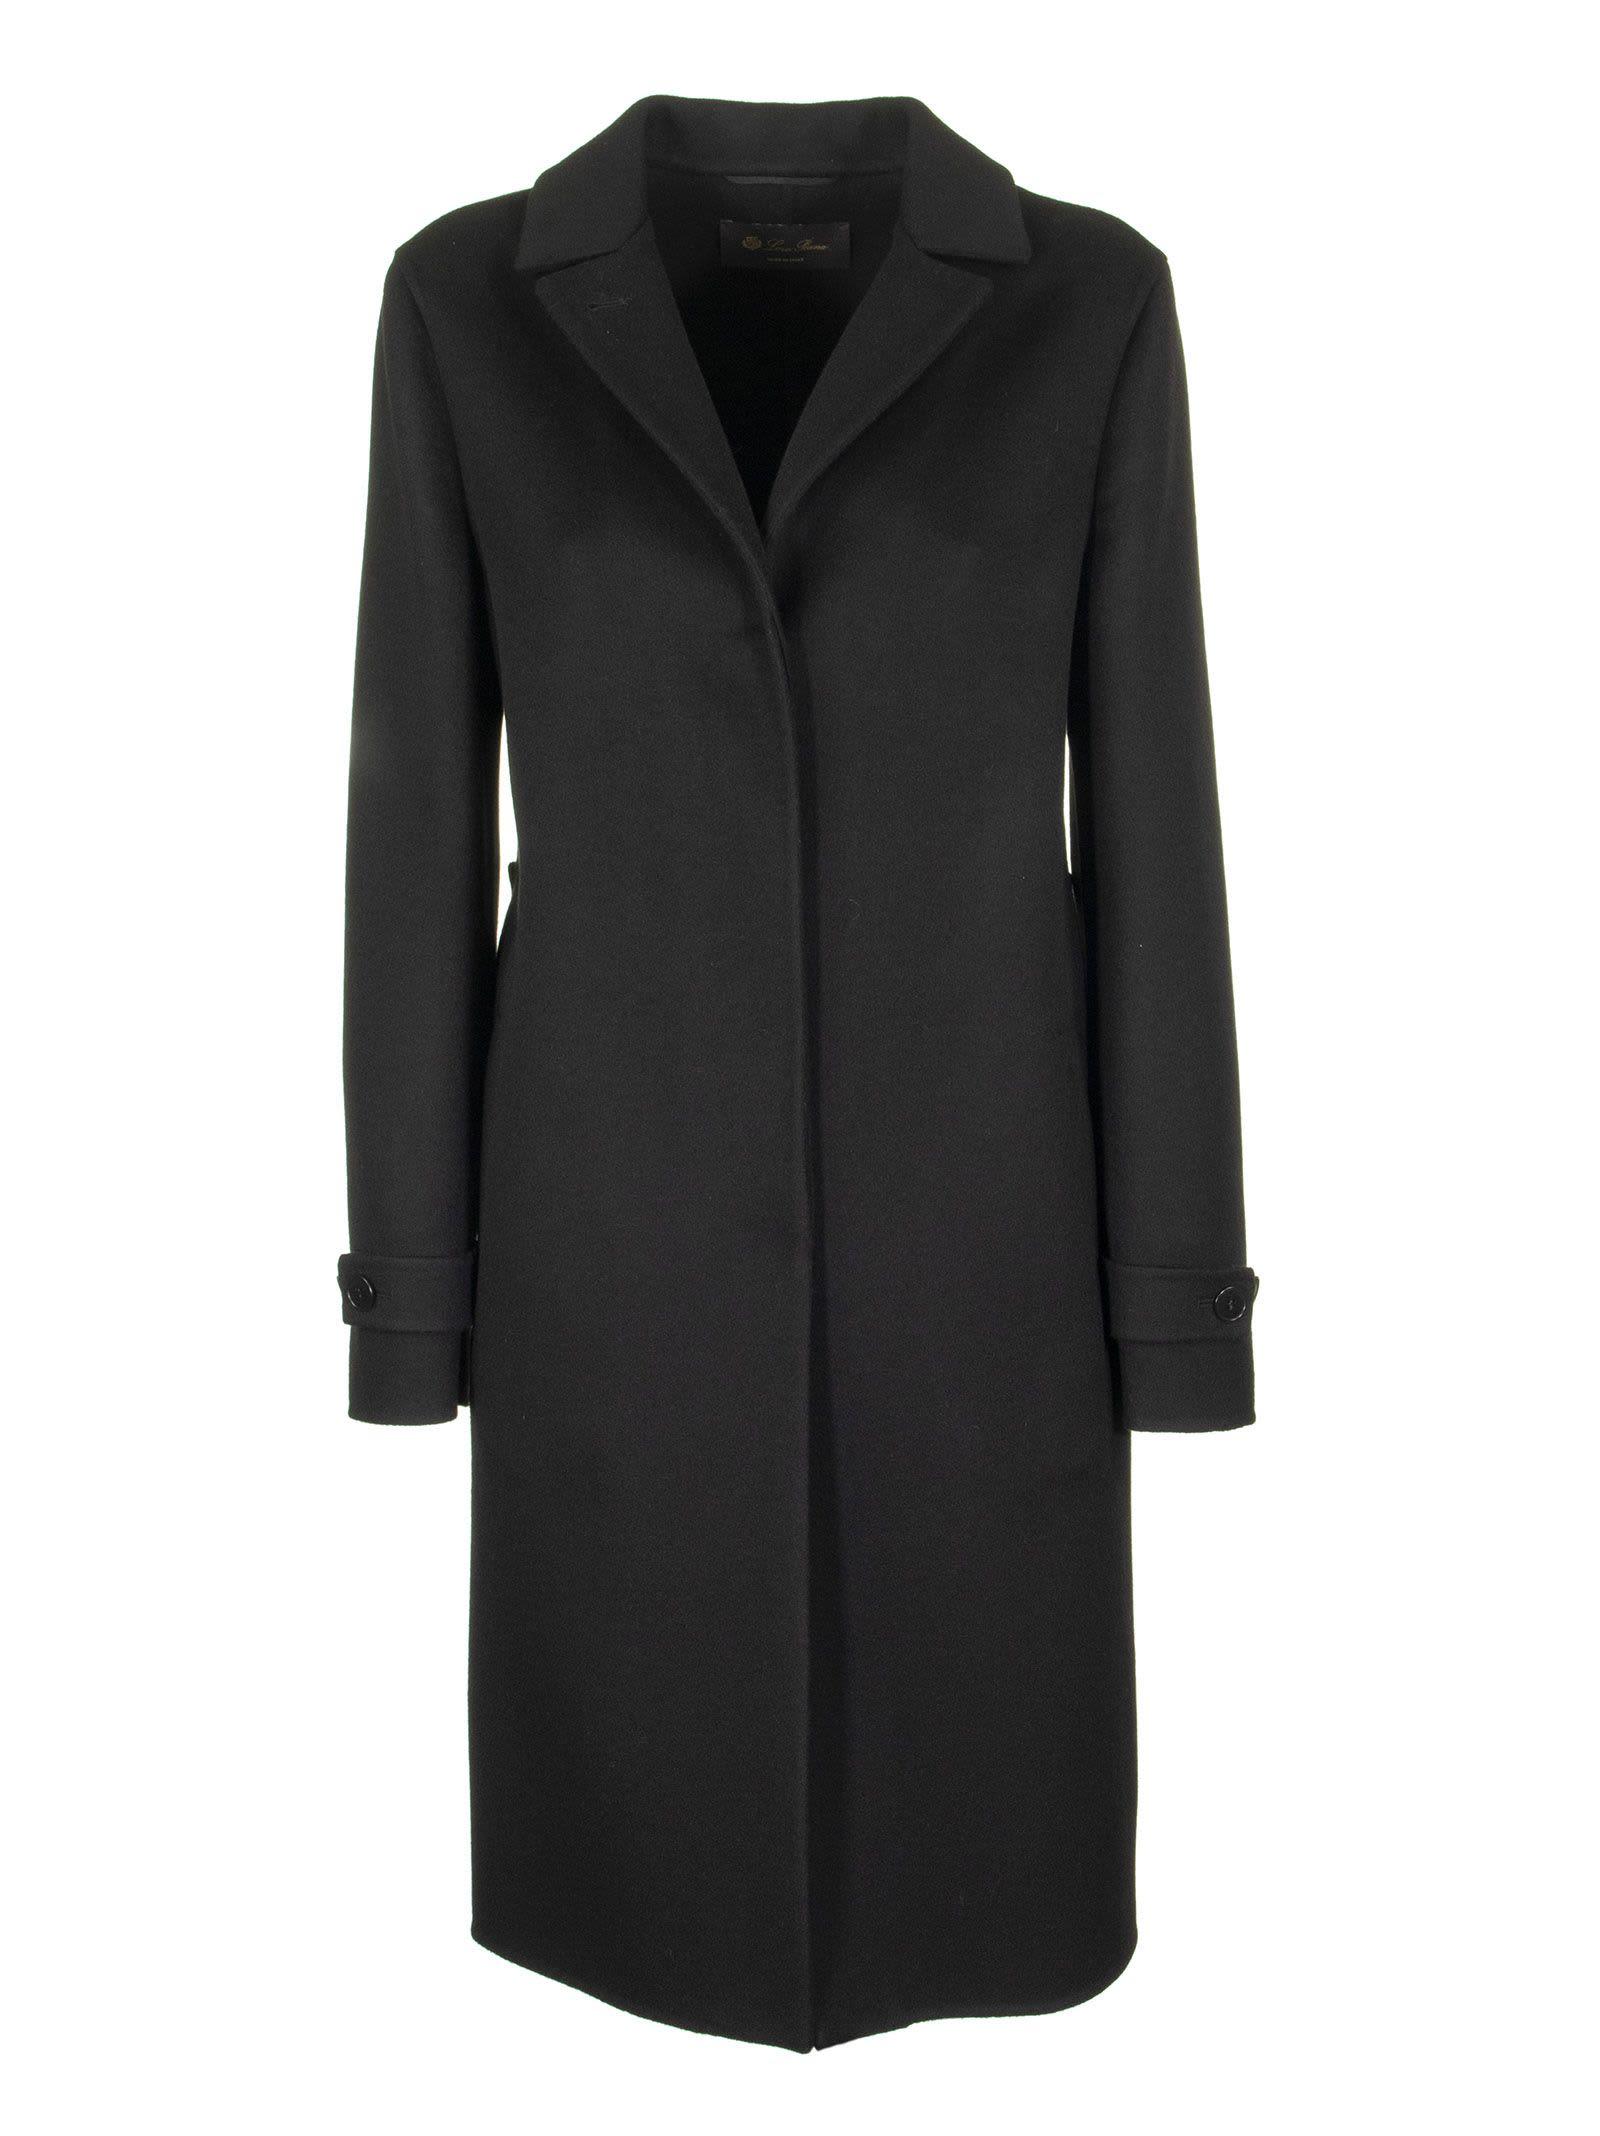 Loro Piana Breaden Cashmere Black Coat